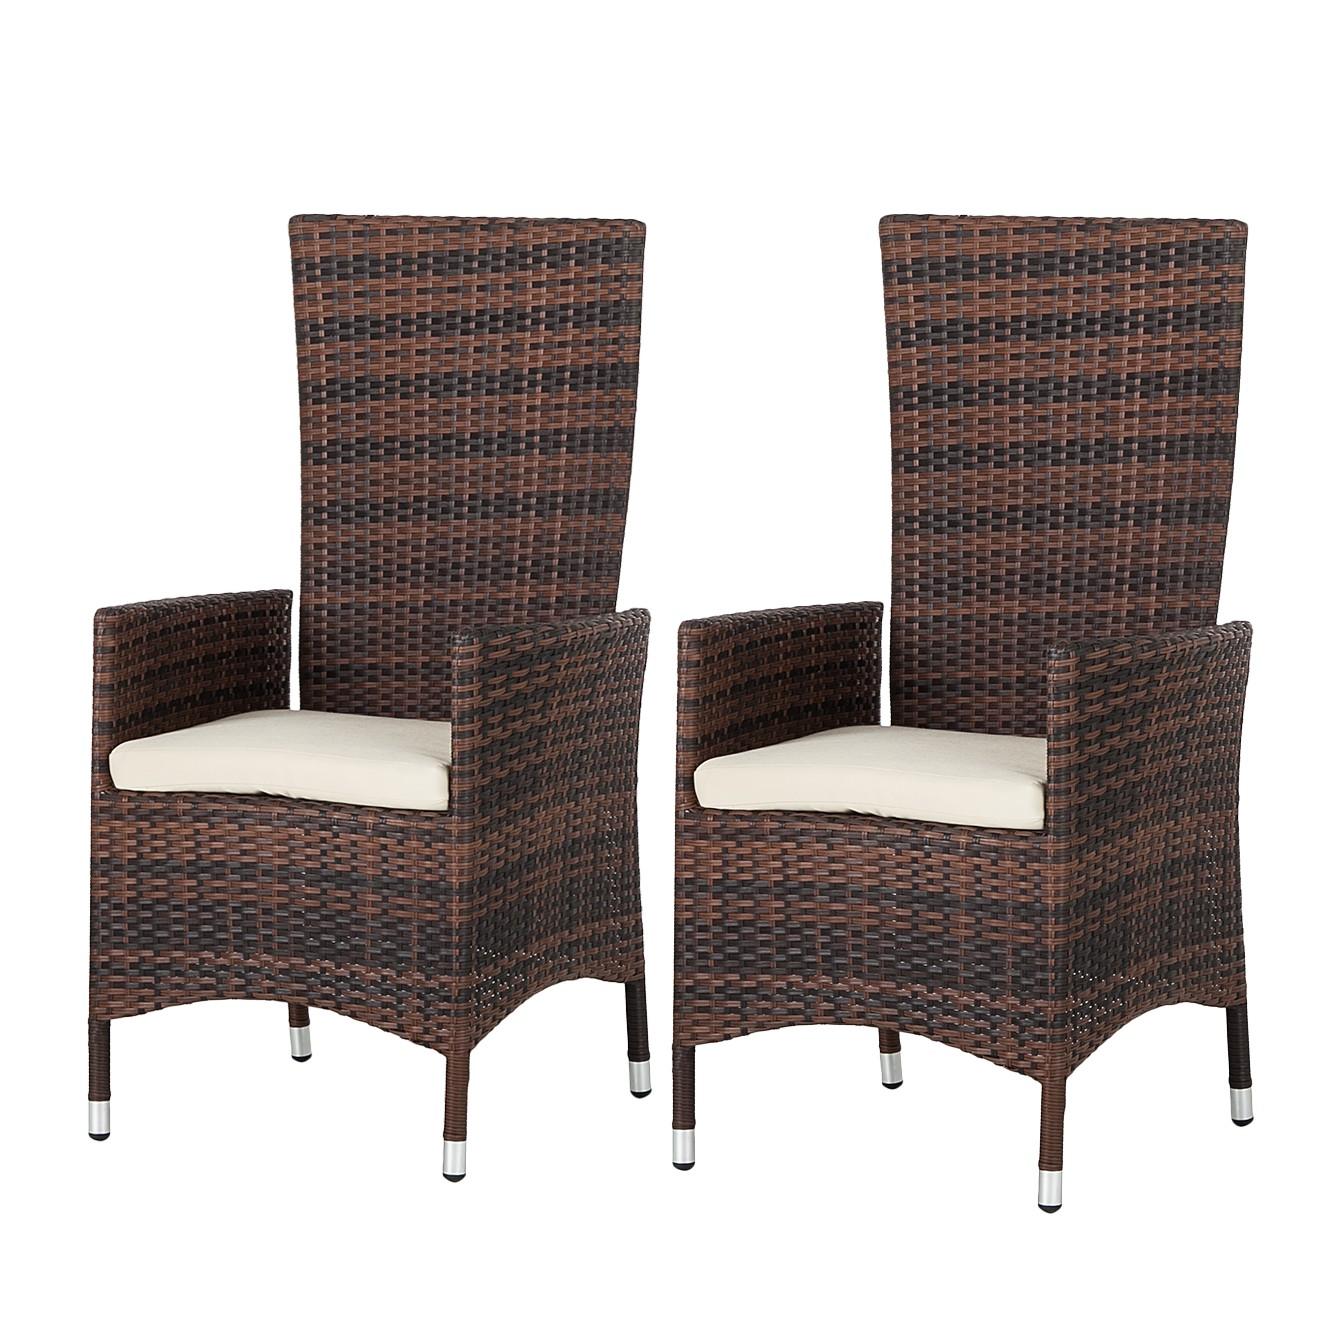 Chaise de jardin Paradise Lounge - Dossier haut - Polyrotin, Fredriks